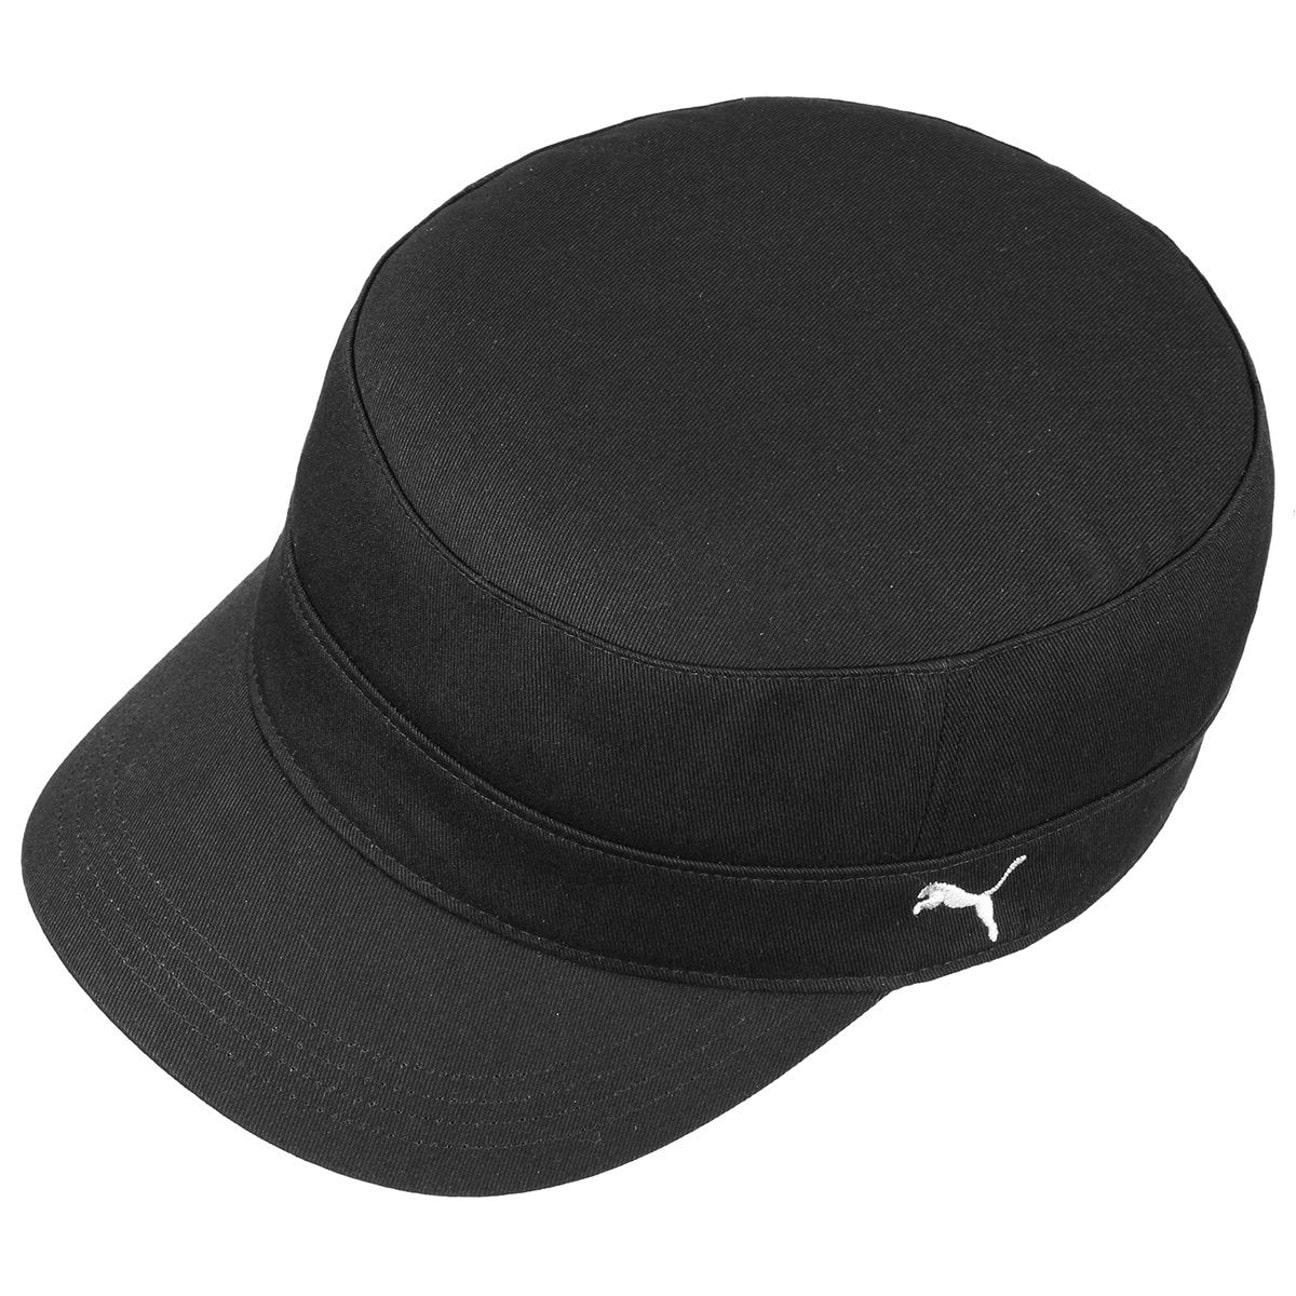 Gorra Militar Essential by PUMA - Gorras - sombreroshop.es 247821df399